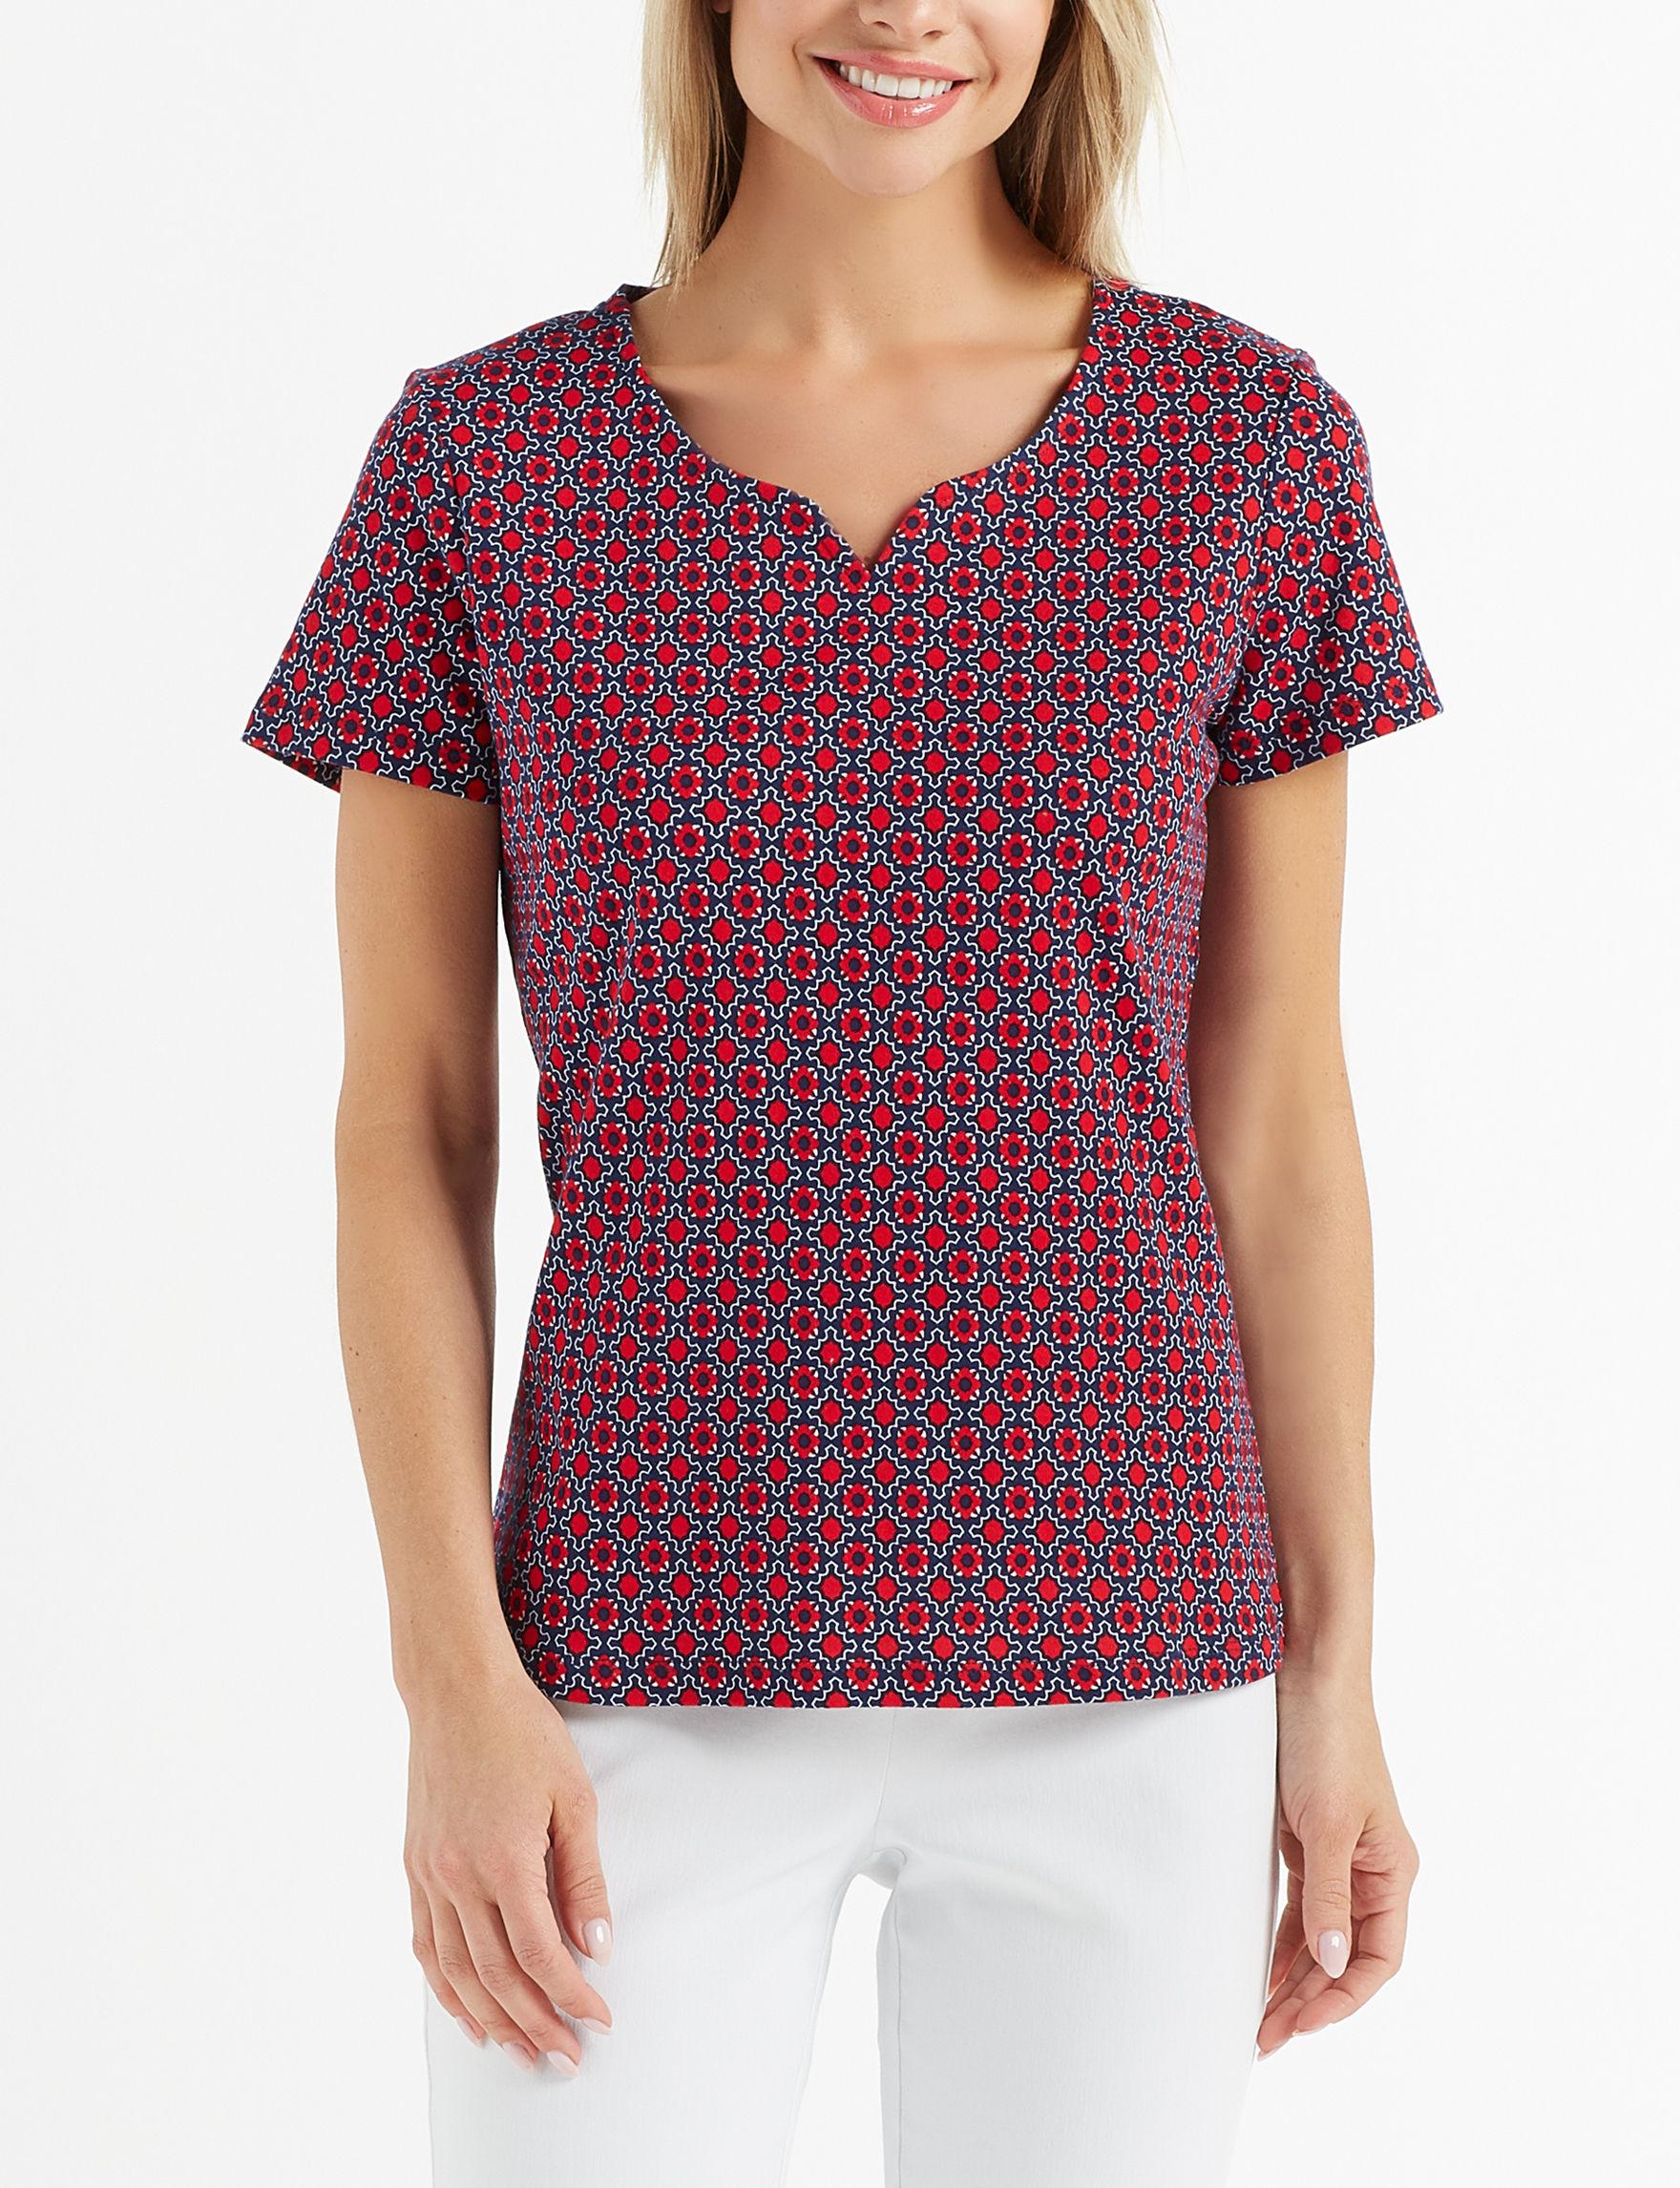 Rebecca Malone Burgundy Shirts & Blouses Tees & Tanks